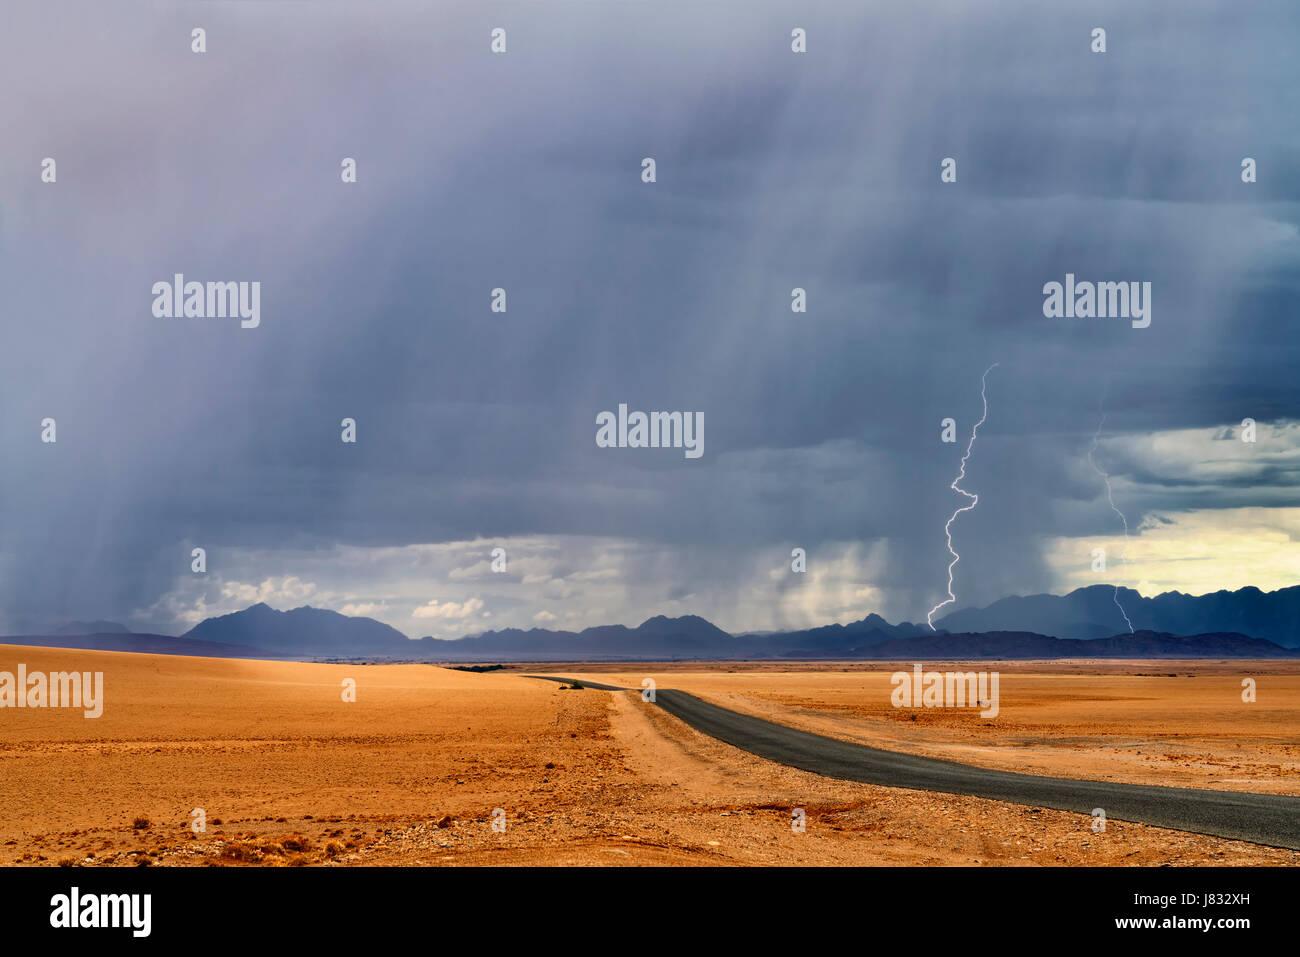 Desert road with lightning storm - Stock Image